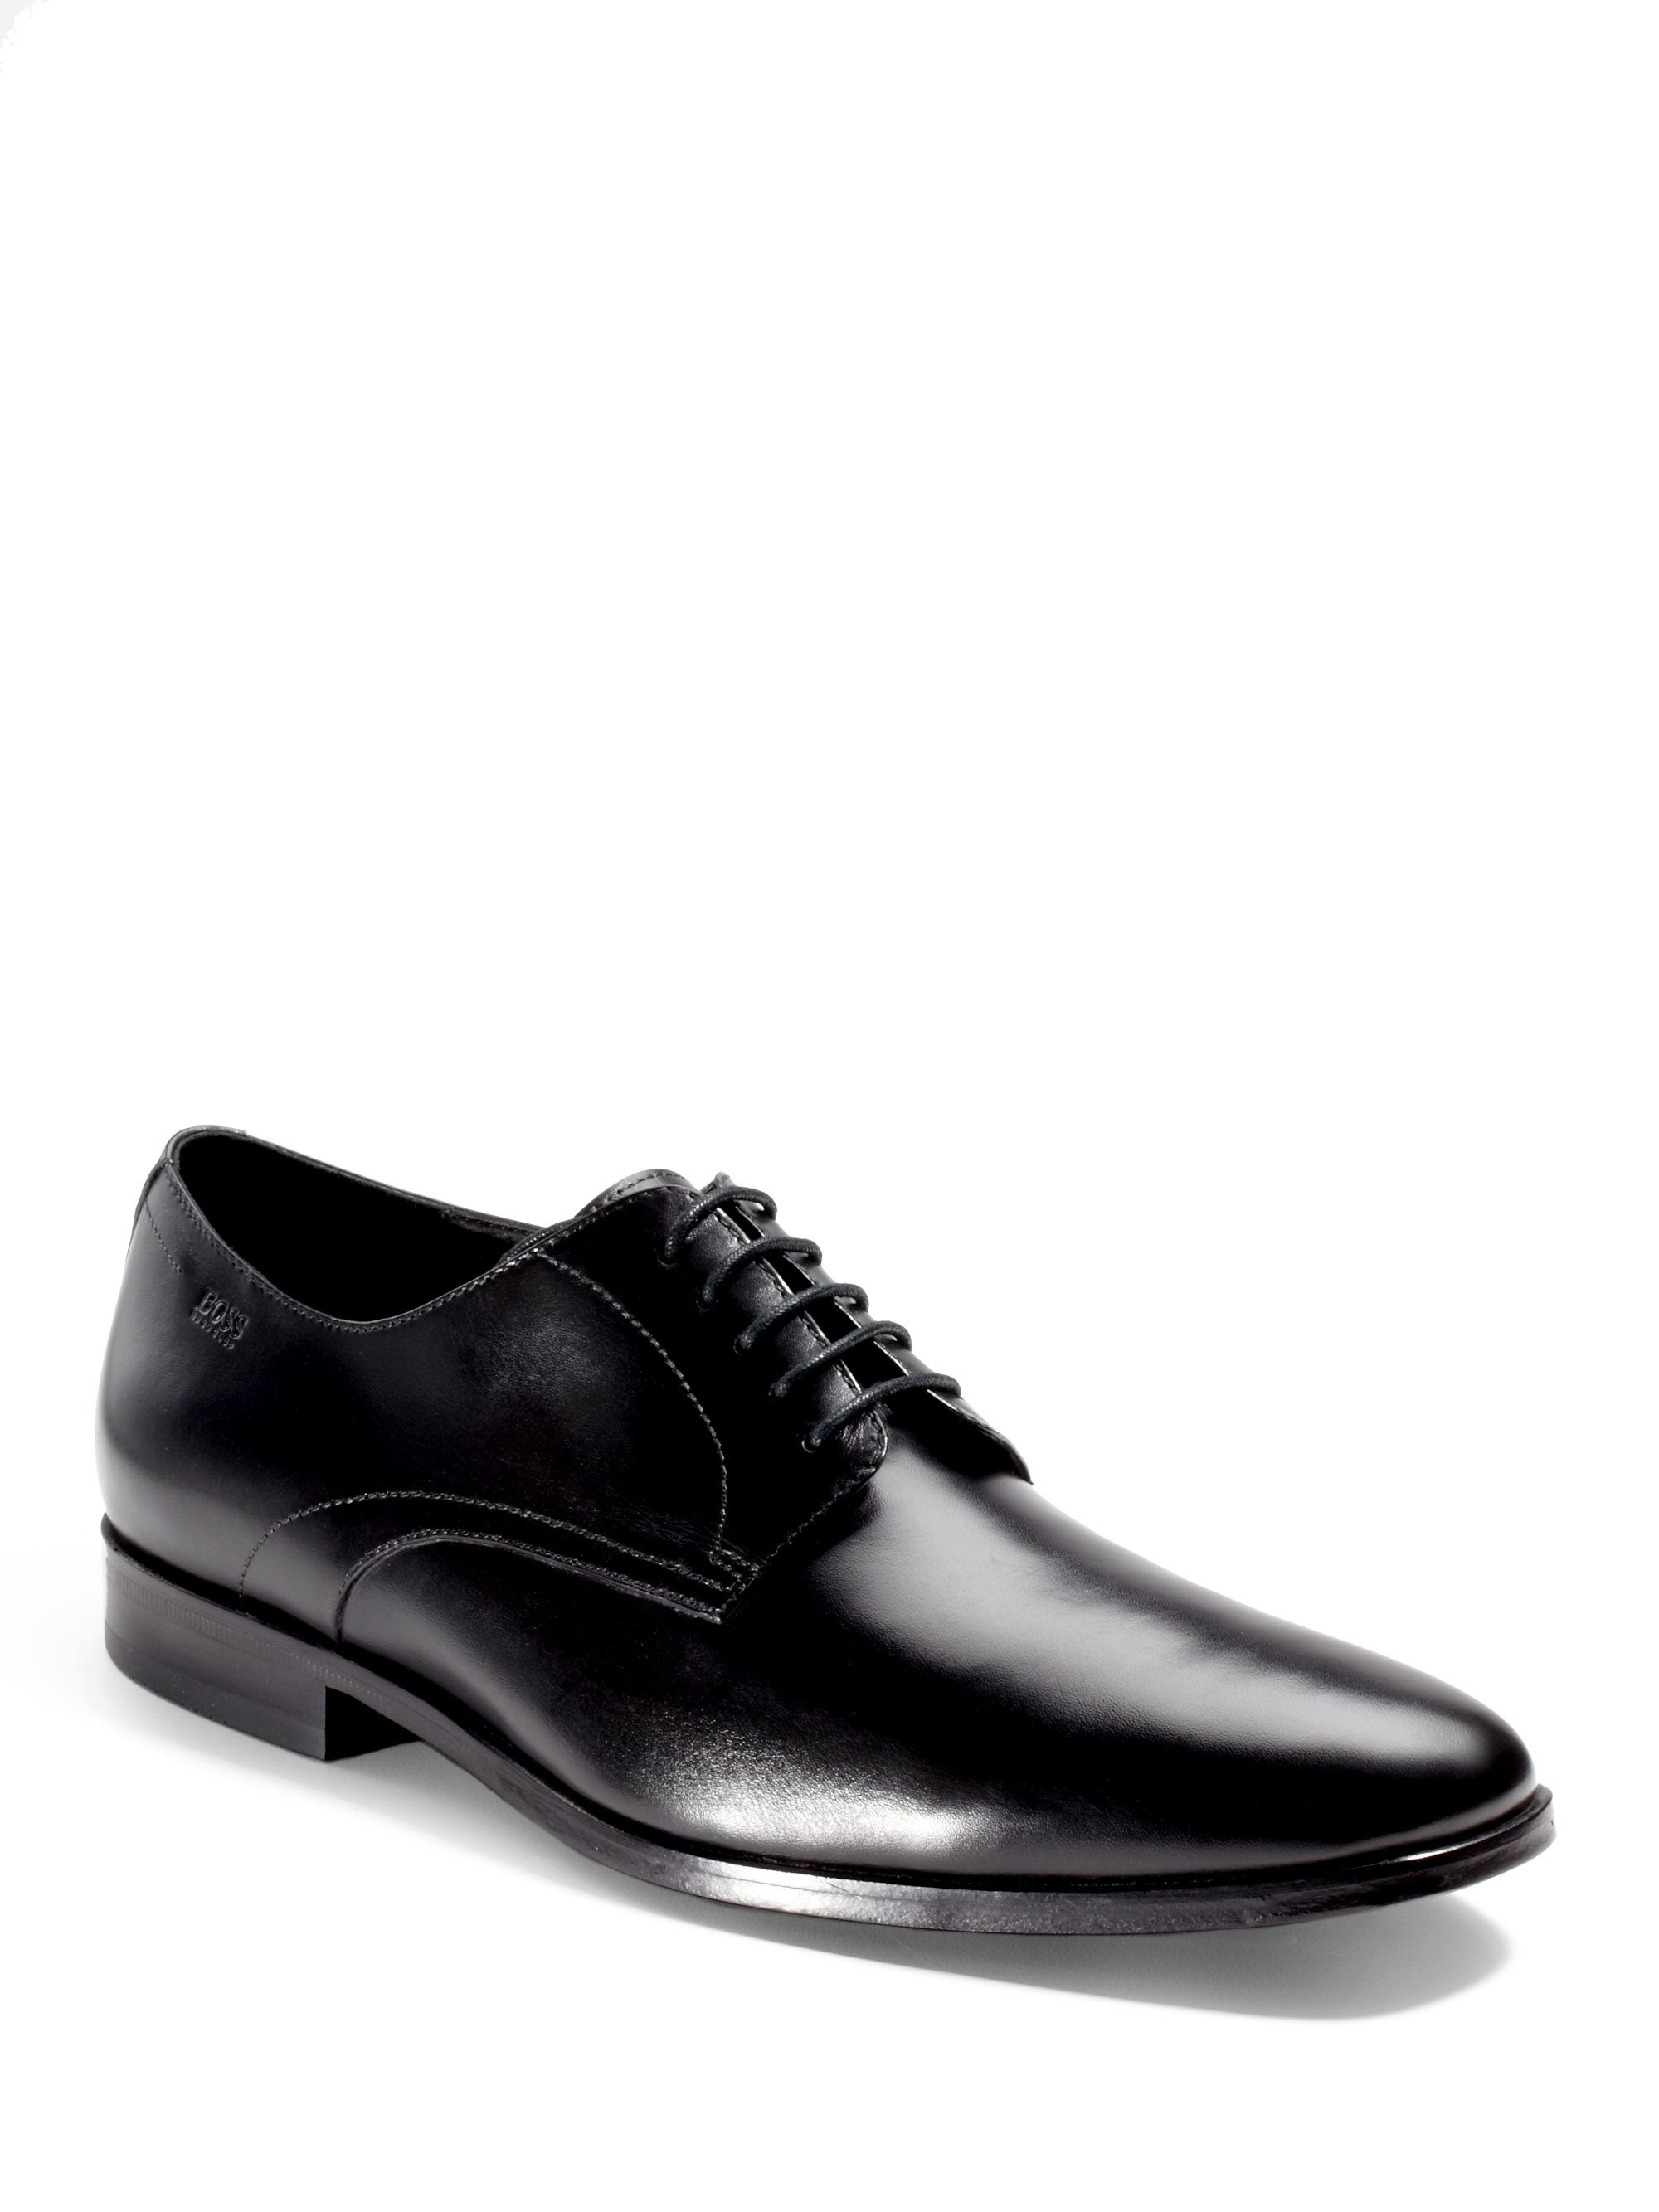 Hugo Boss Oxford Shoes Heel